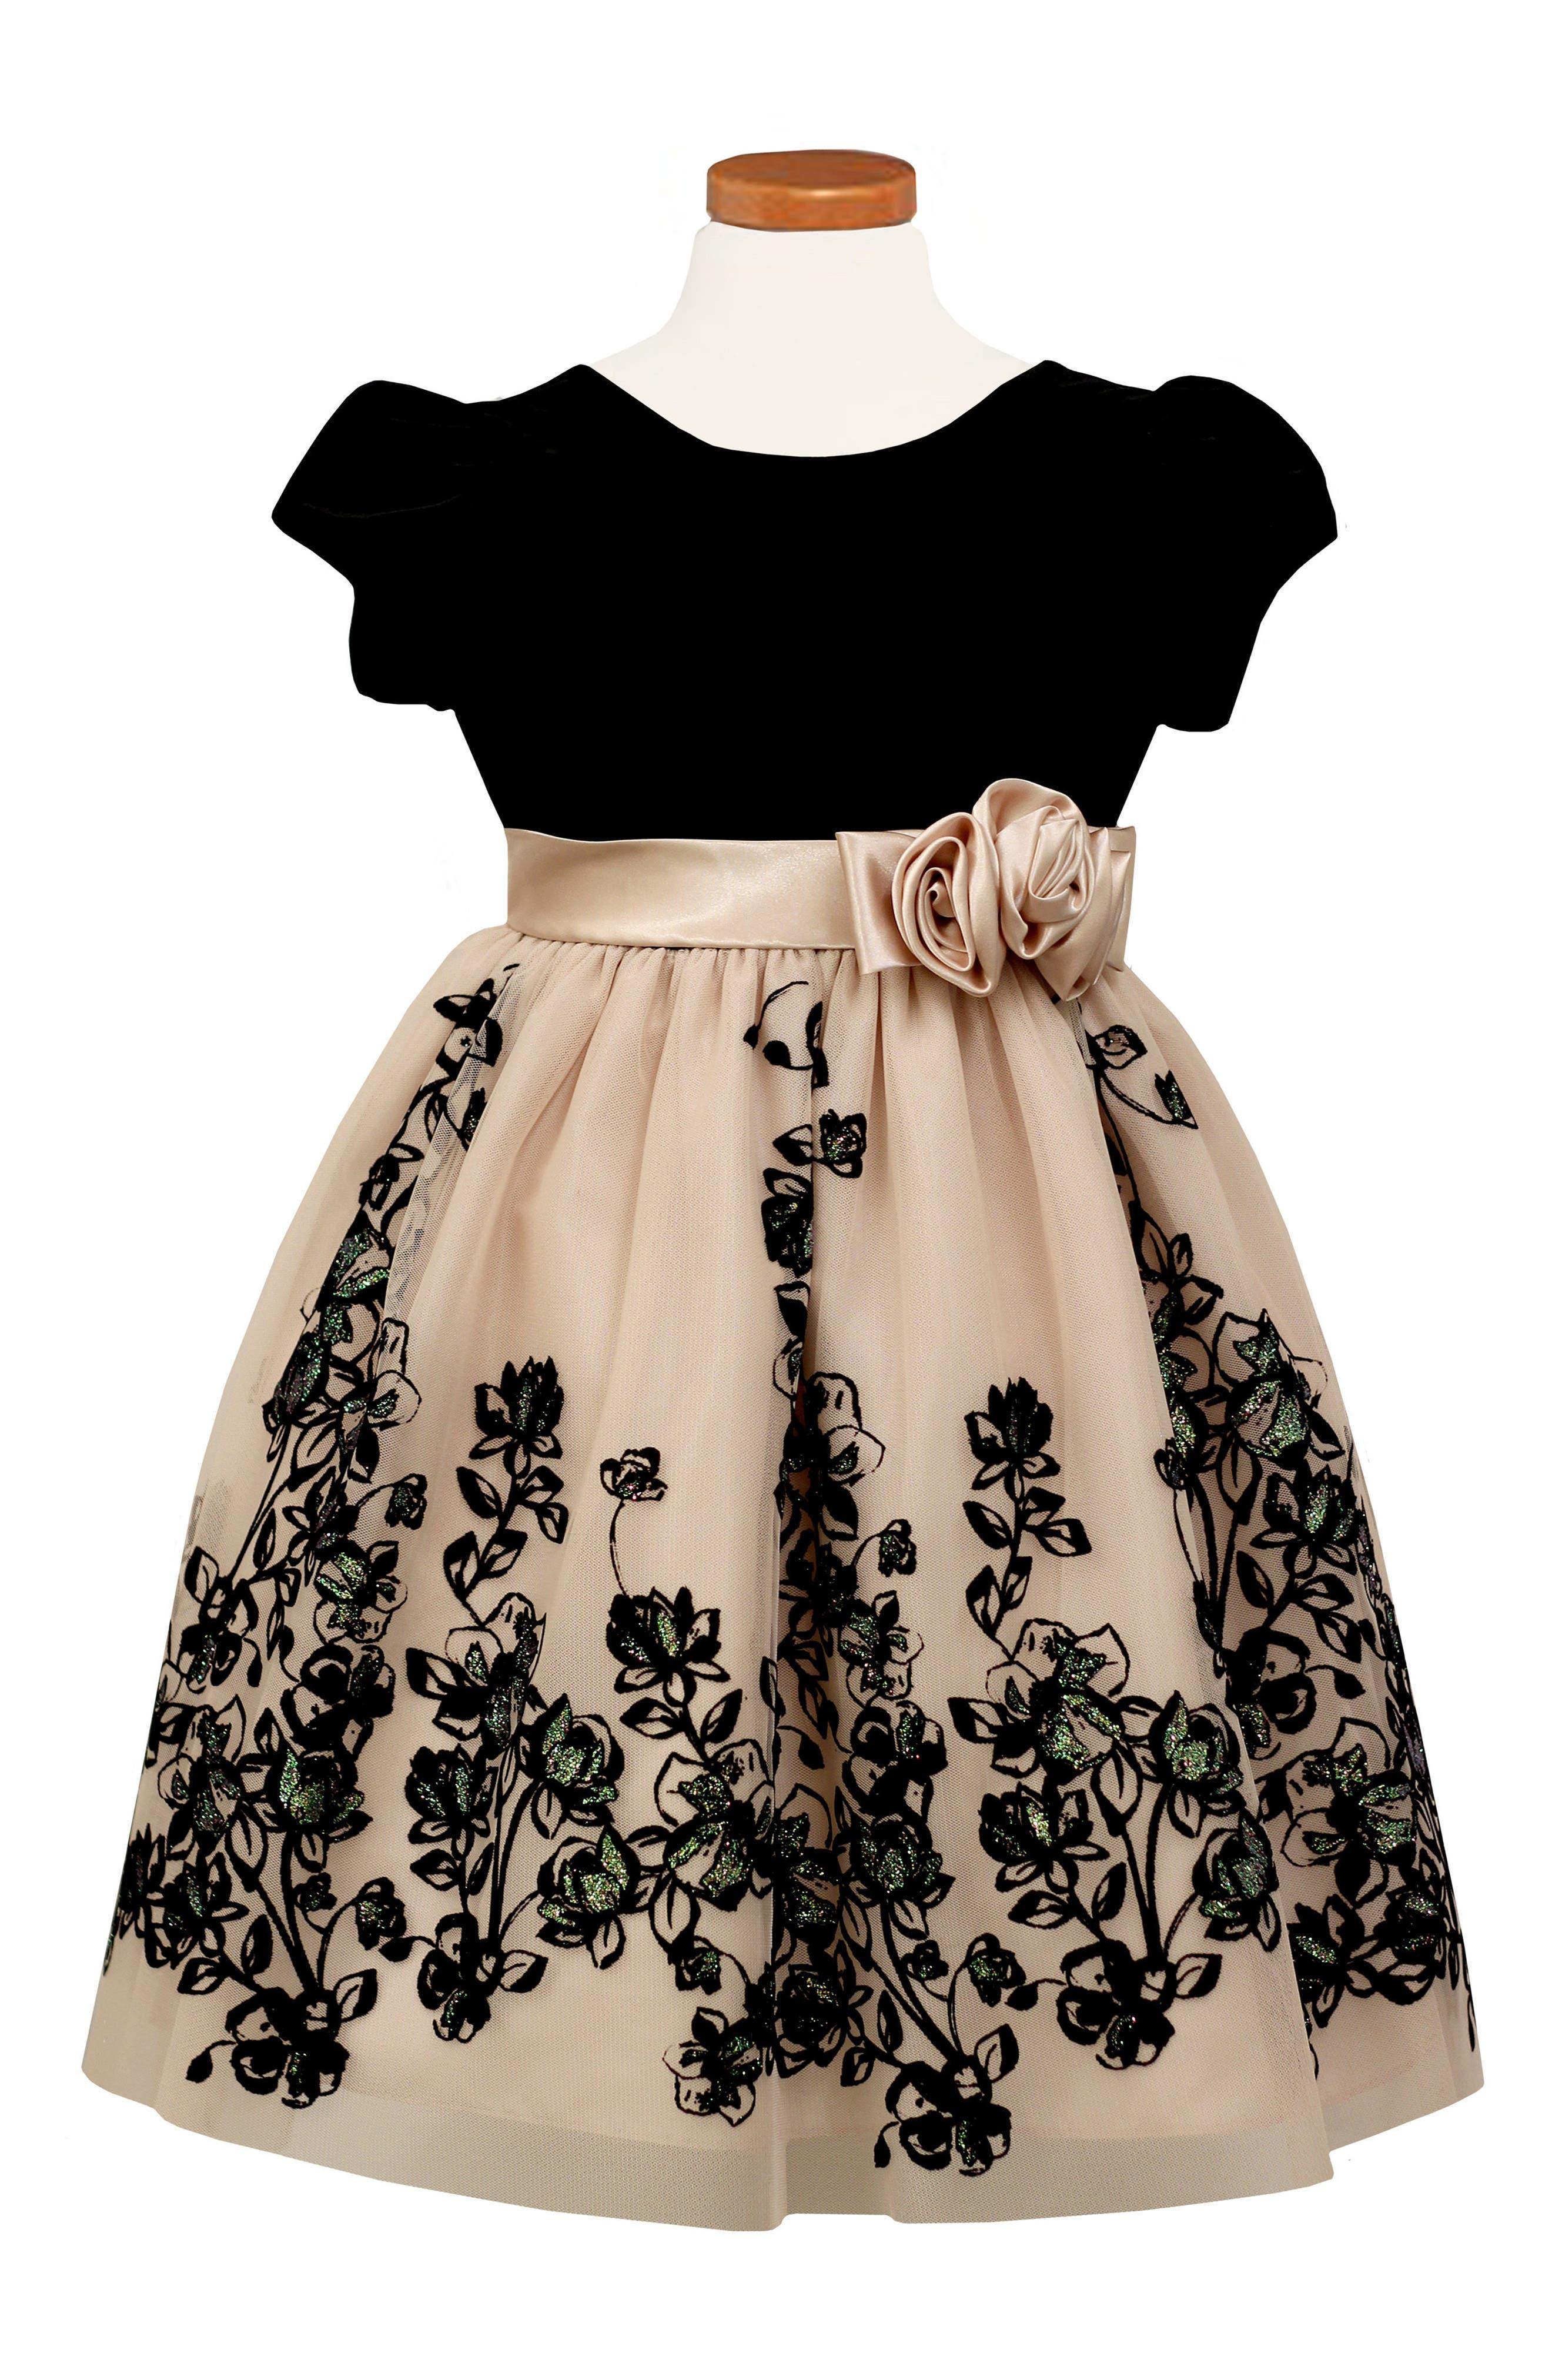 Alternate Image 1 Selected - Sorbet Velvet Bodice Fit & Flare Dress (Big Girls)